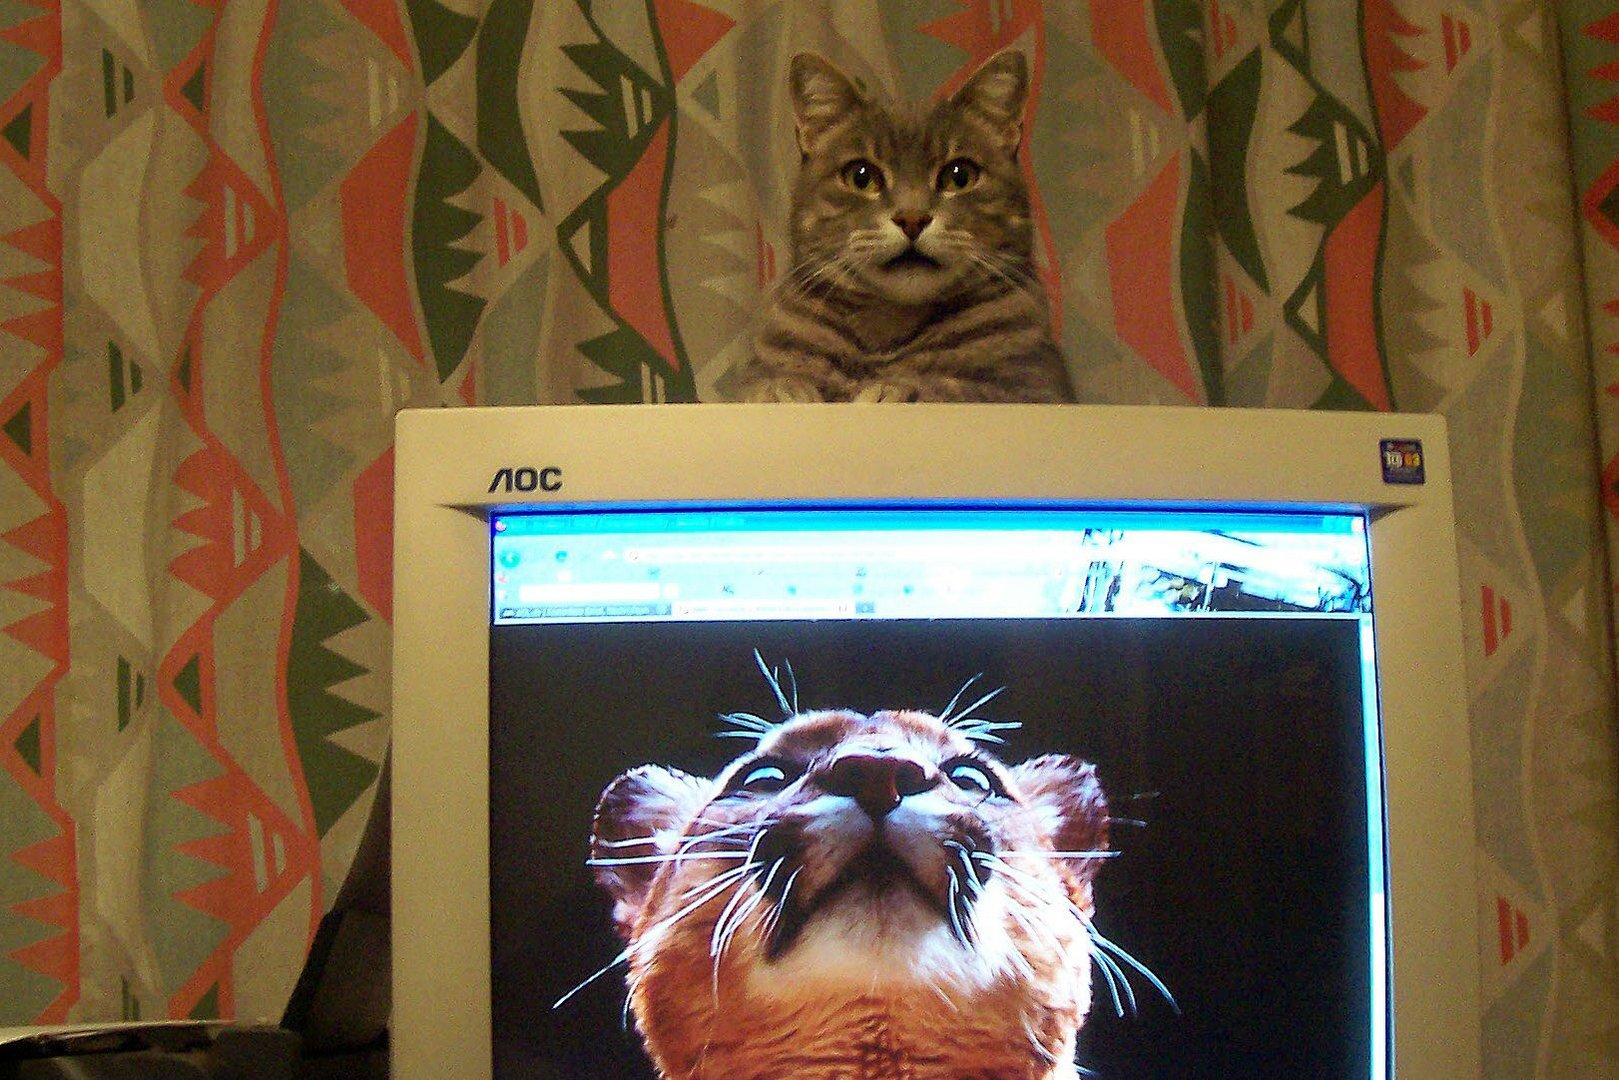 Katze Lilly immer oben